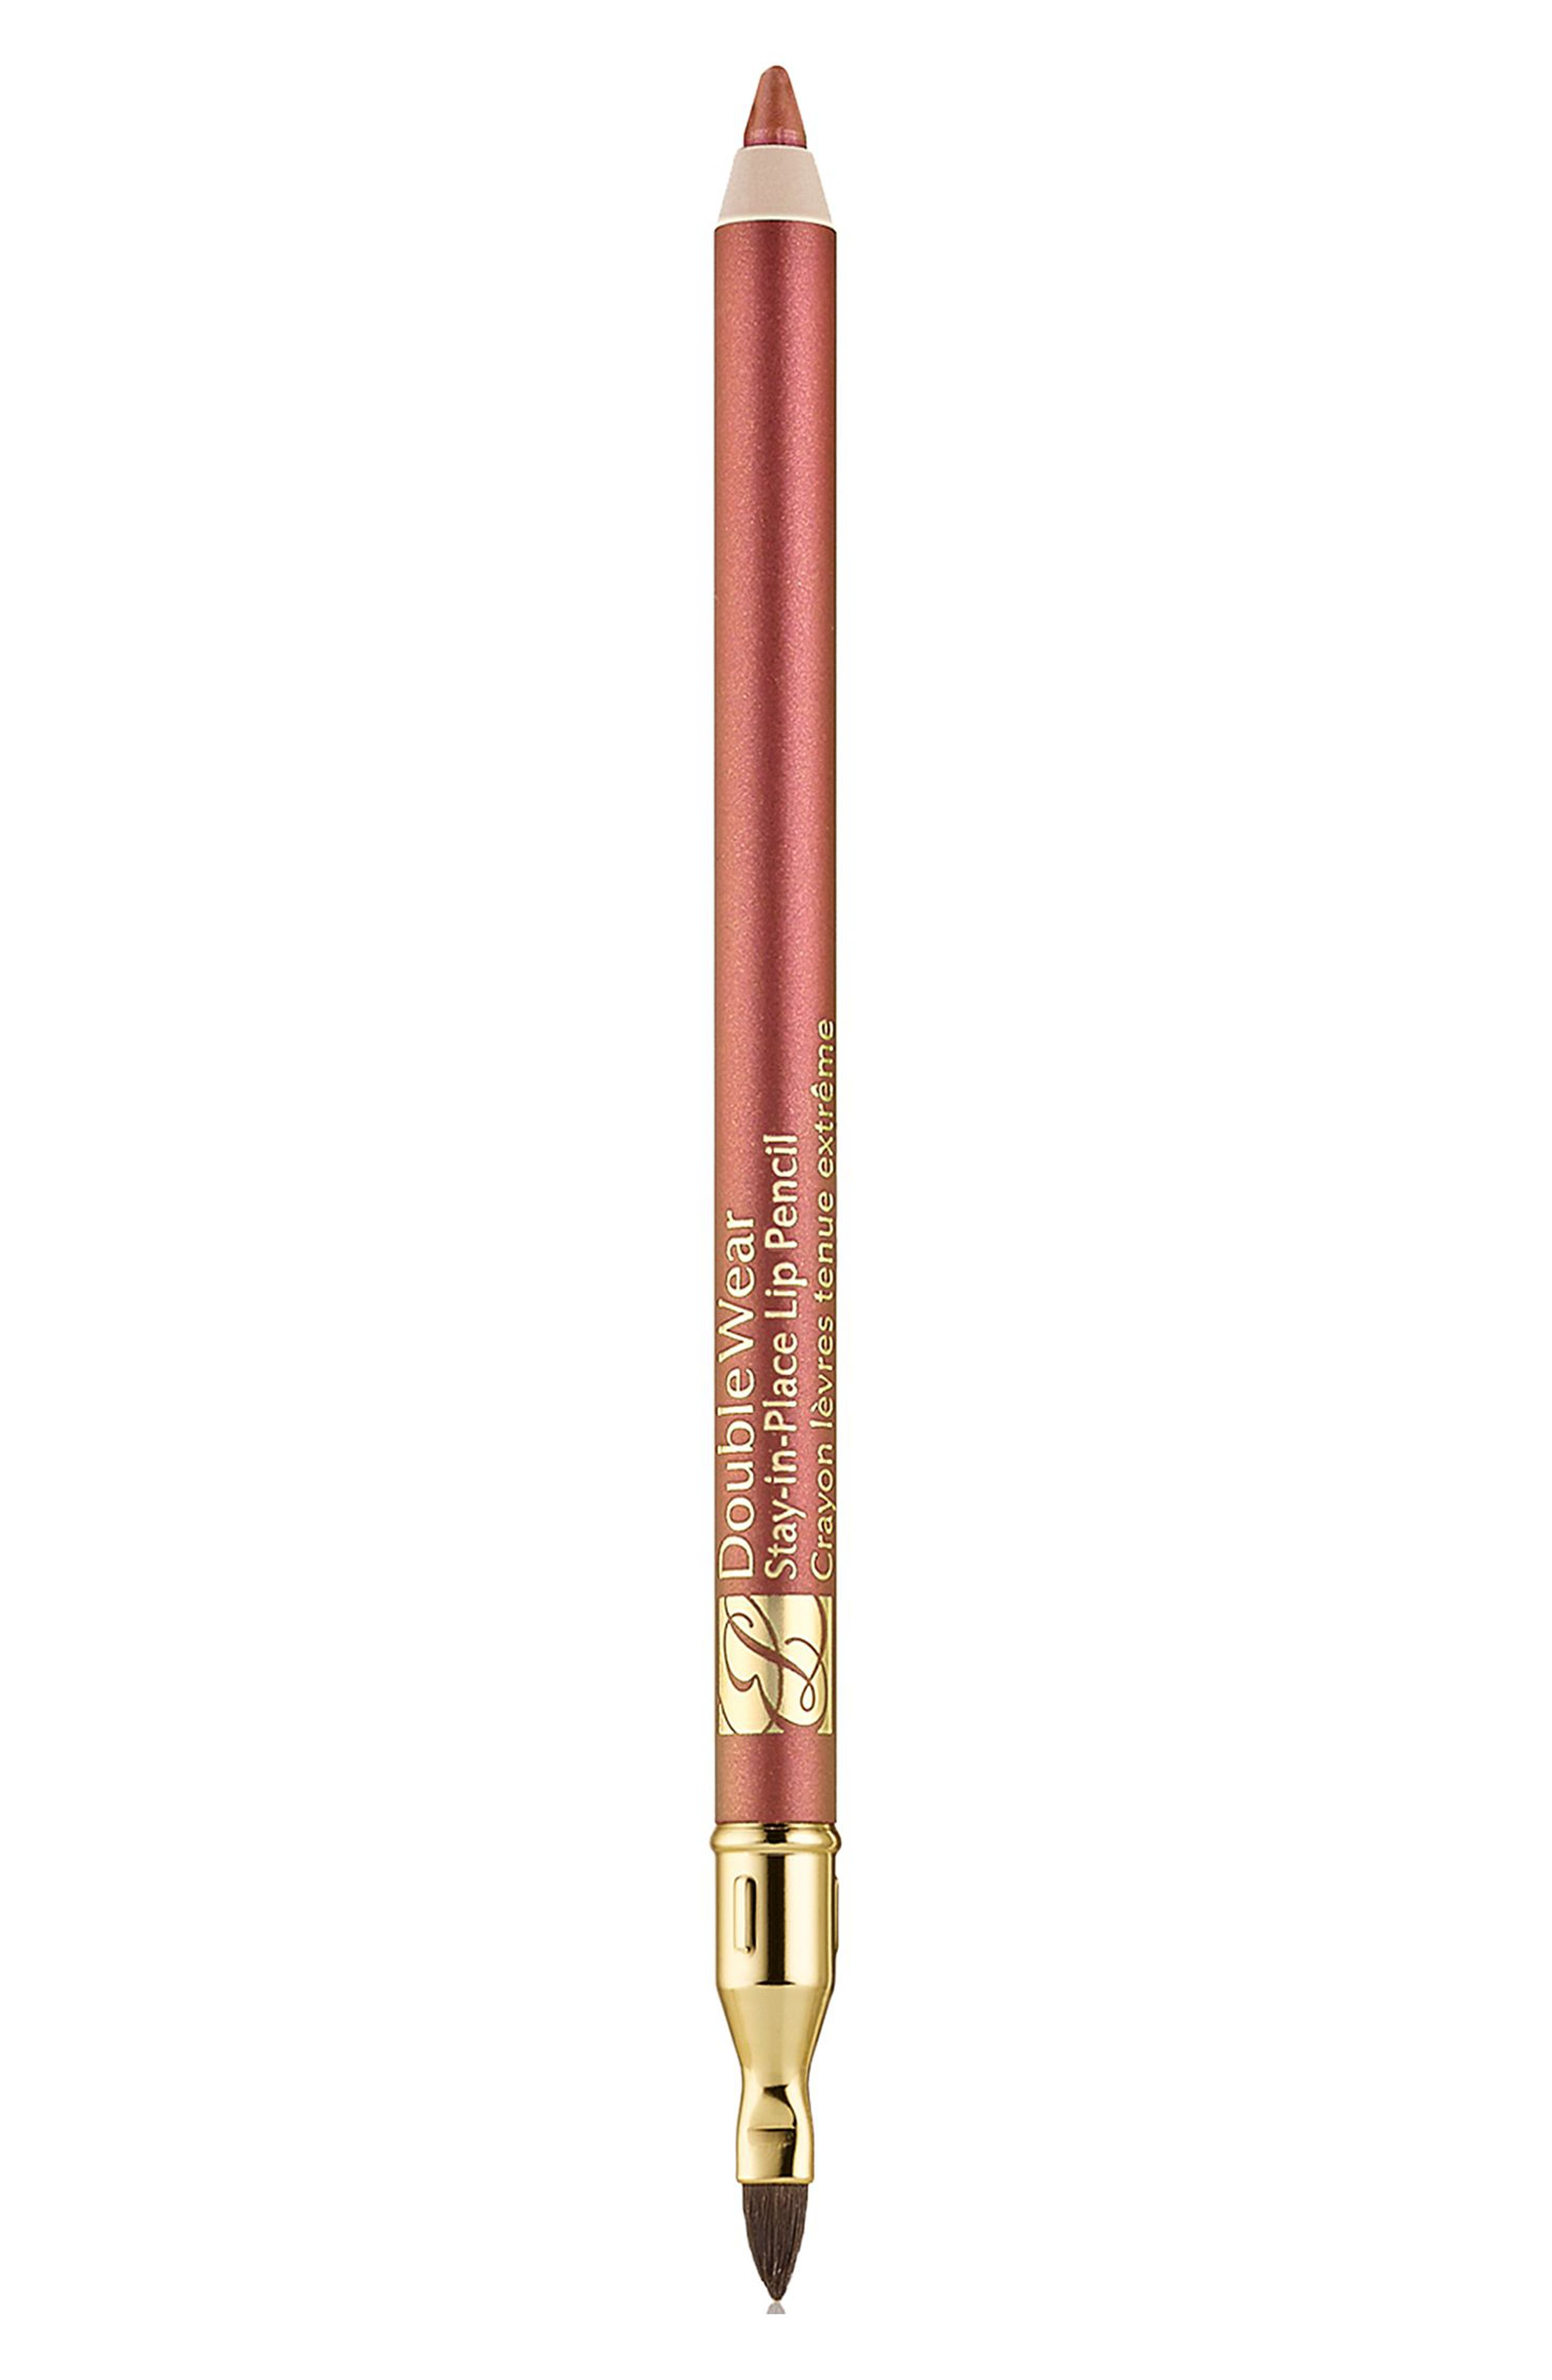 Estee Lauder Double Wear Stay-In-Place Lip Pencil - Nude